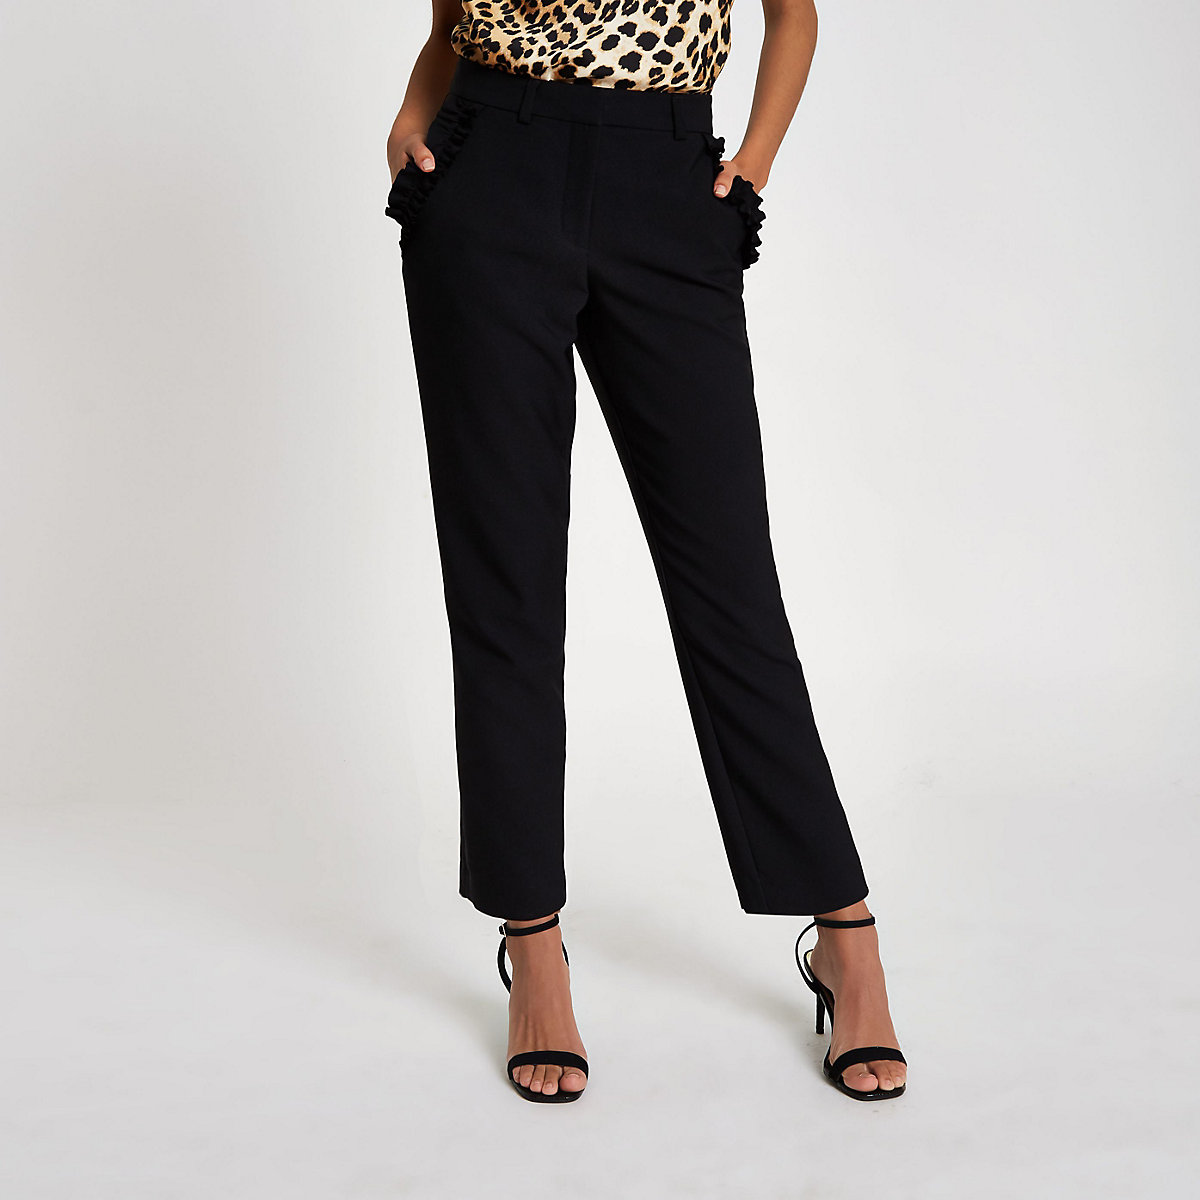 Black frill pocket cigarette trousers